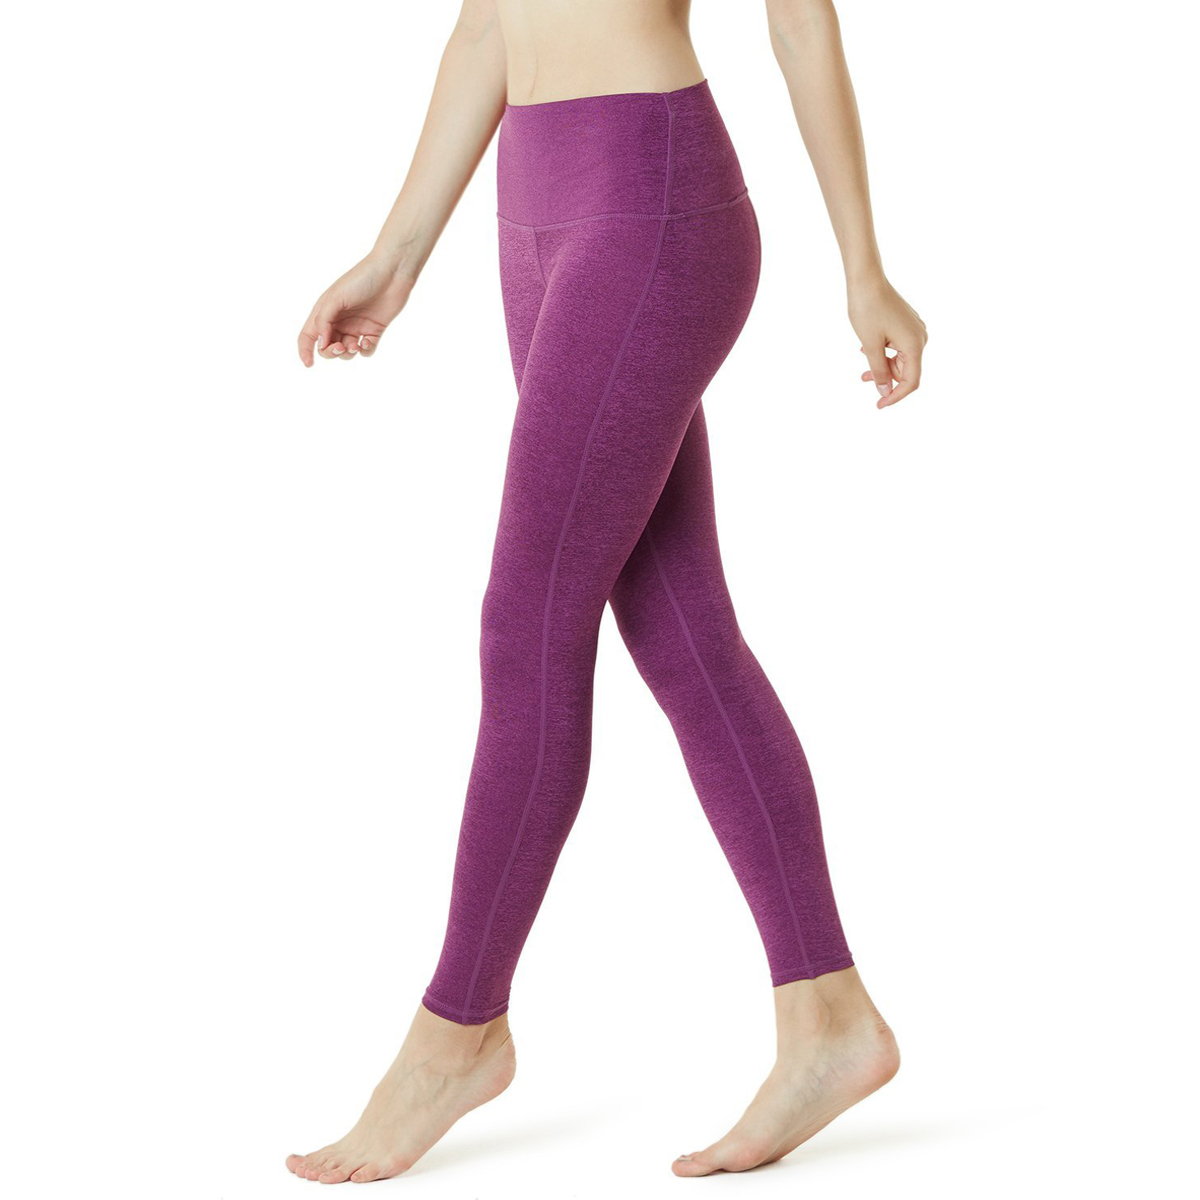 thumbnail 19 - TSLA Tesla FYP42 Women's High-Waisted Ultra-Stretch Tummy Control Yoga Pants